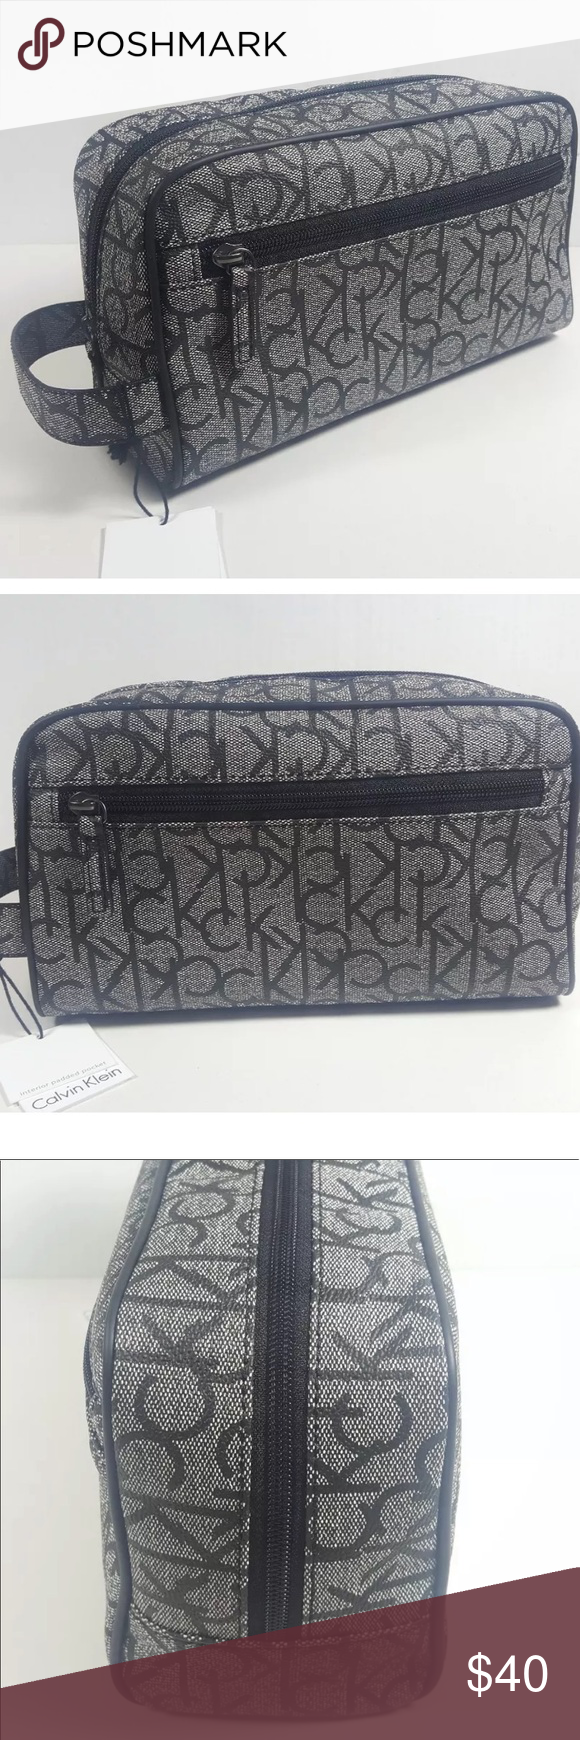 a71921d0fe Calvin Klein Toiletry kit bag CALVIN KLEIN Men s Toiletry Case Shaving Kit  New with Tags Calvin